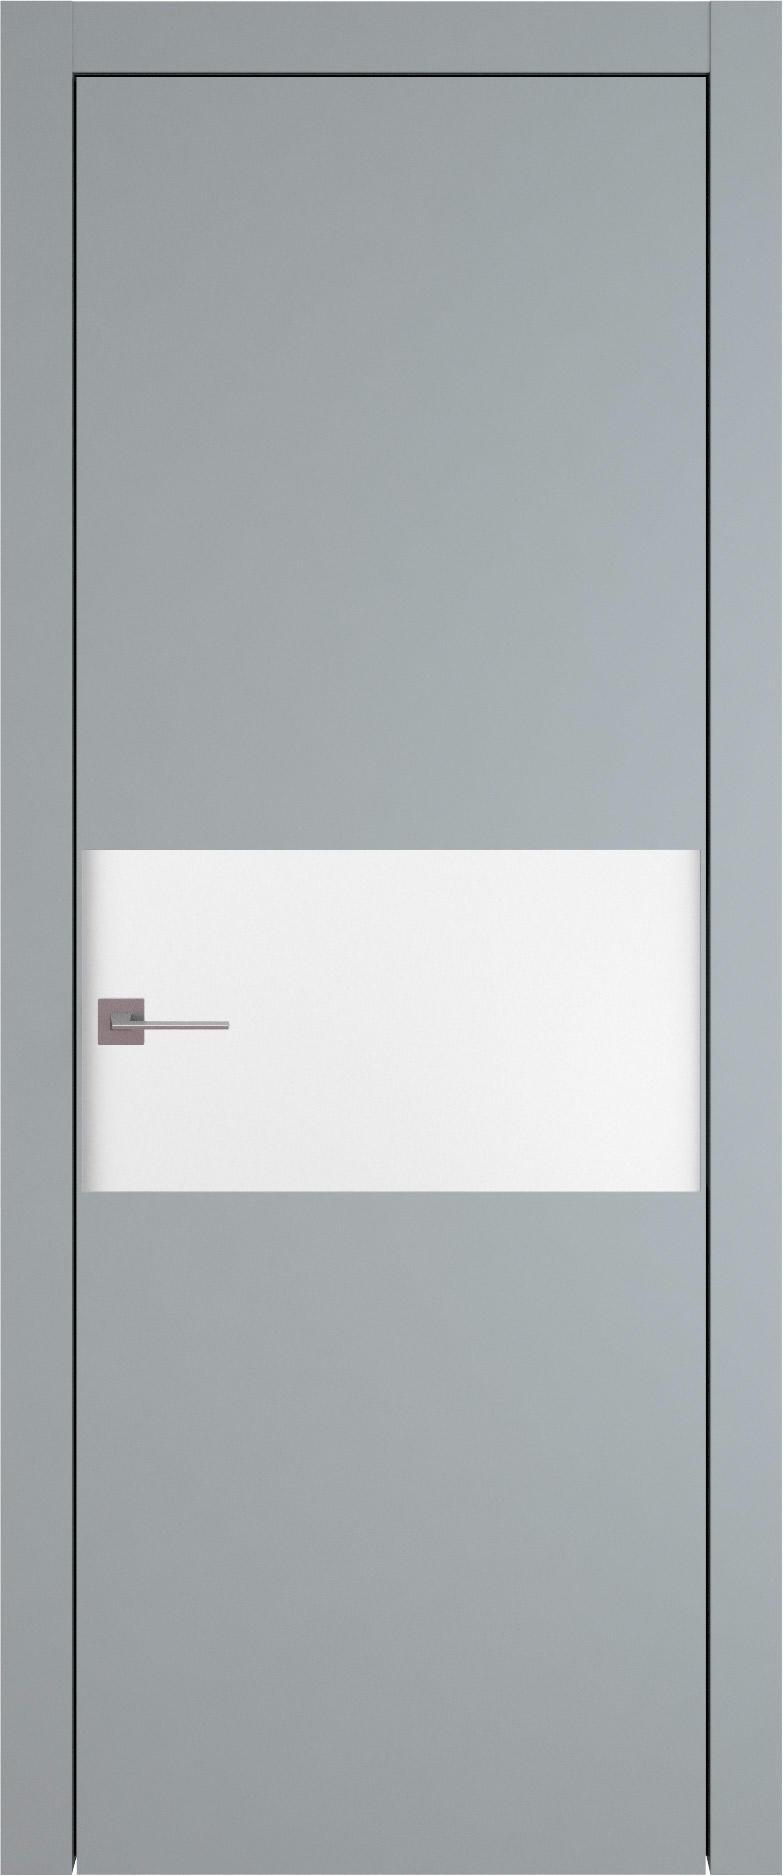 Tivoli Е-4 цвет - Серебристо-серая эмаль (RAL 7045) Без стекла (ДГ)